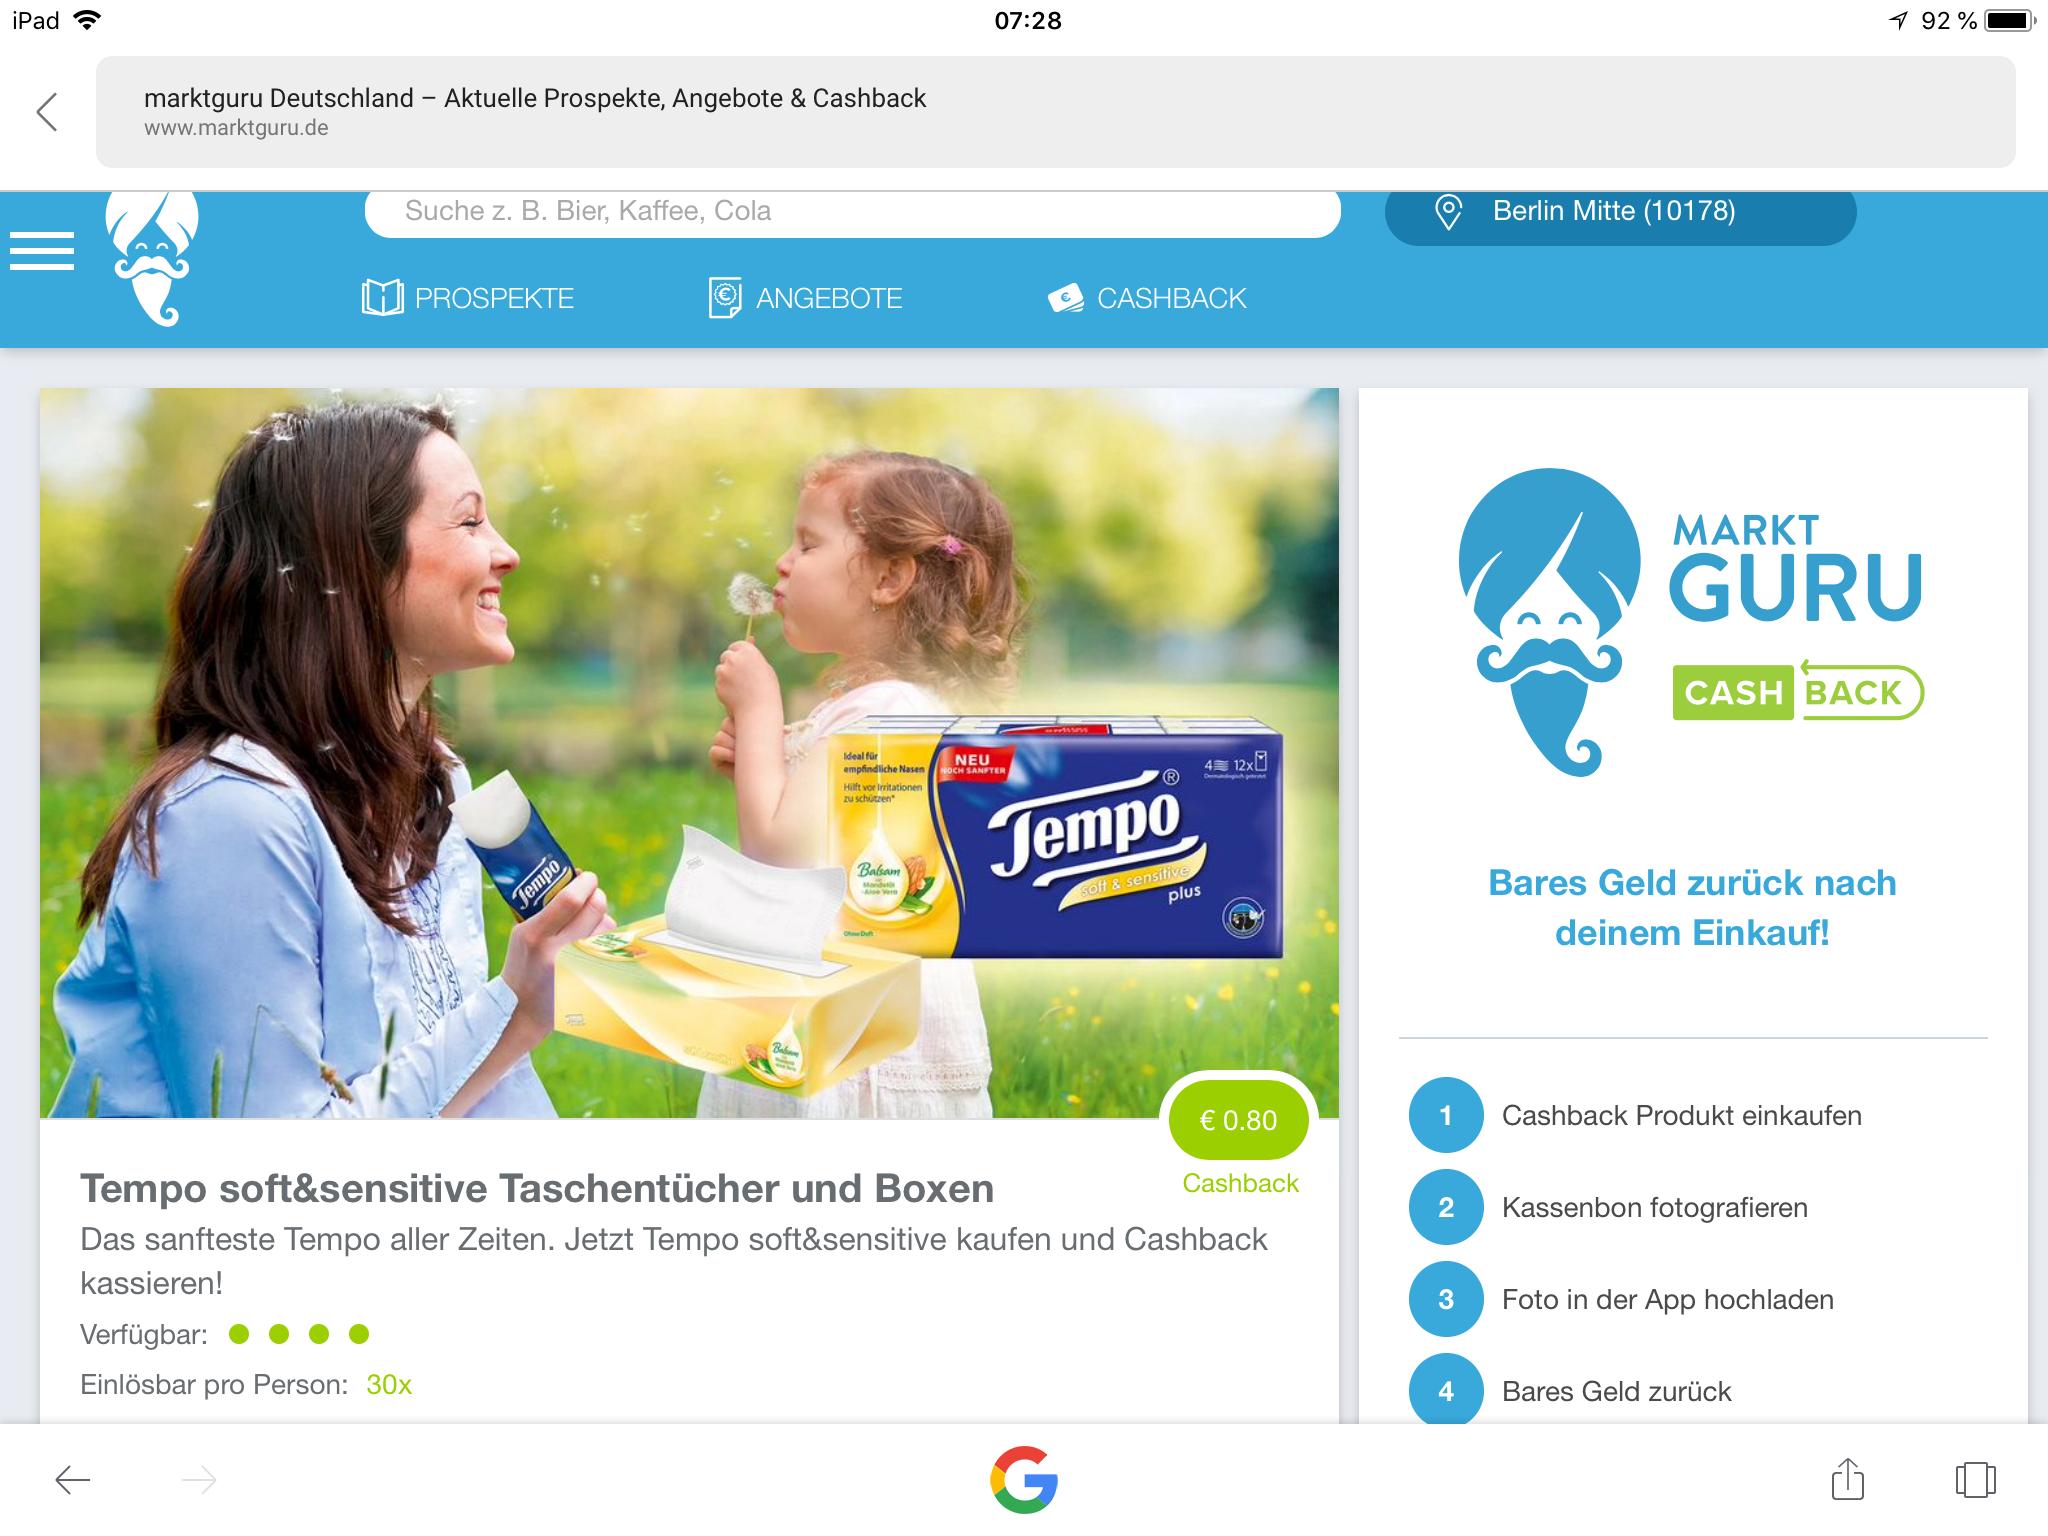 (Marktguru) -€0,80 auf Tempo soft & sensitive